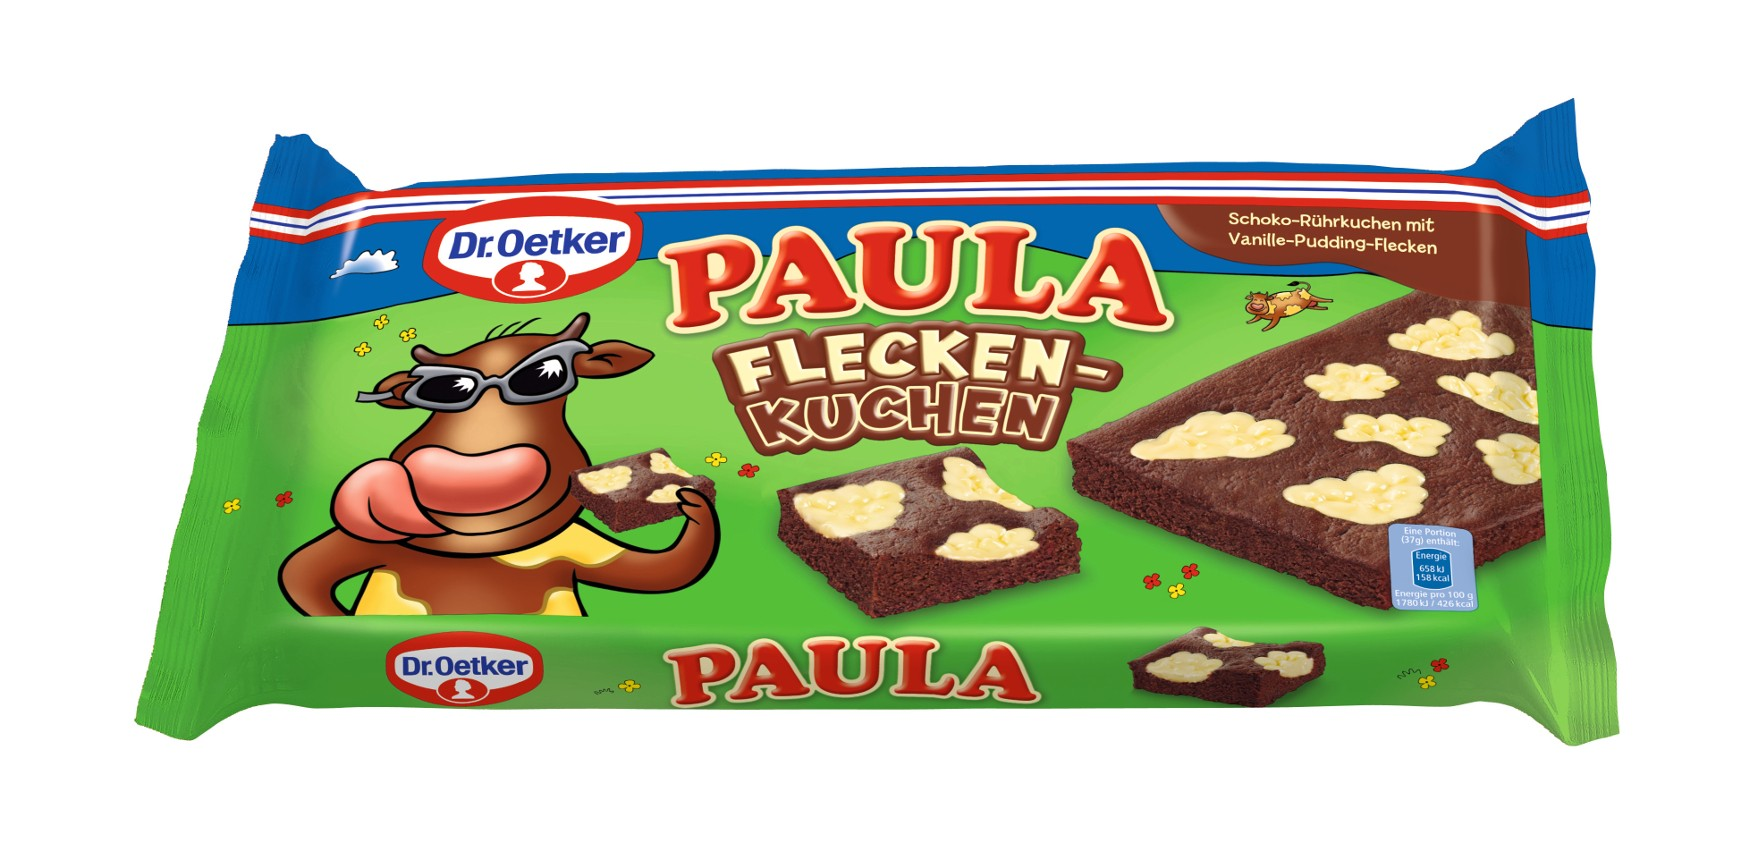 Dr Oetker Paula Fleckenkuchen Mit Vanille Pudding Flecken Kjero Com